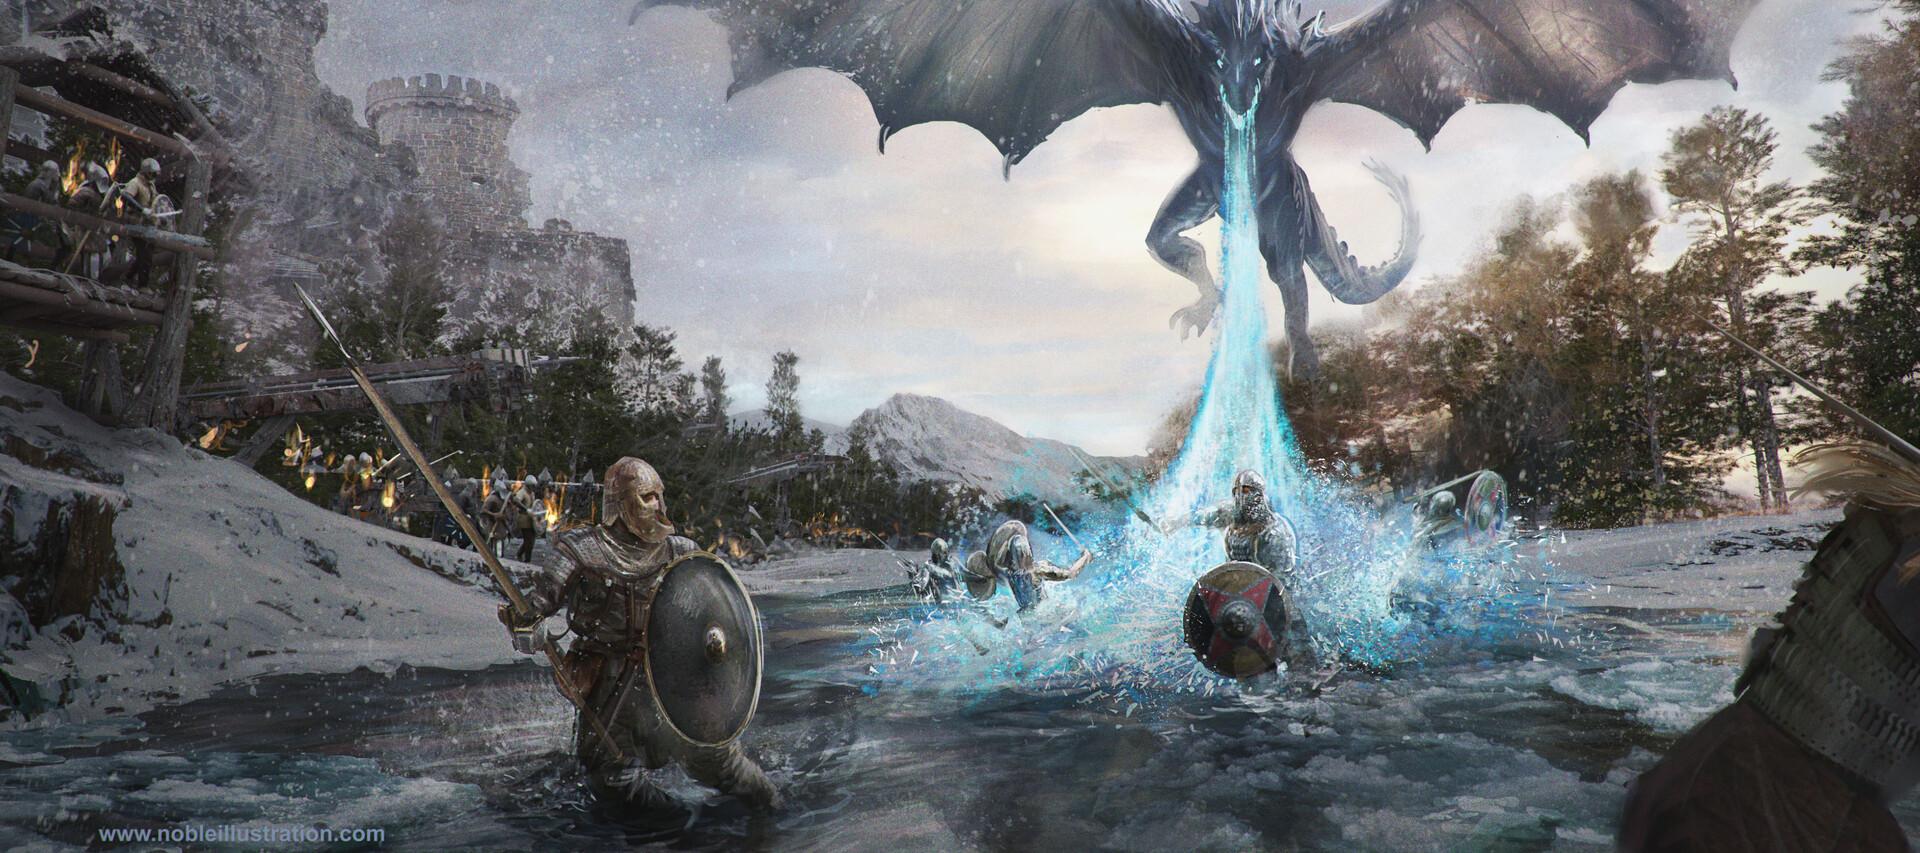 Stephen noble dragonriverfin